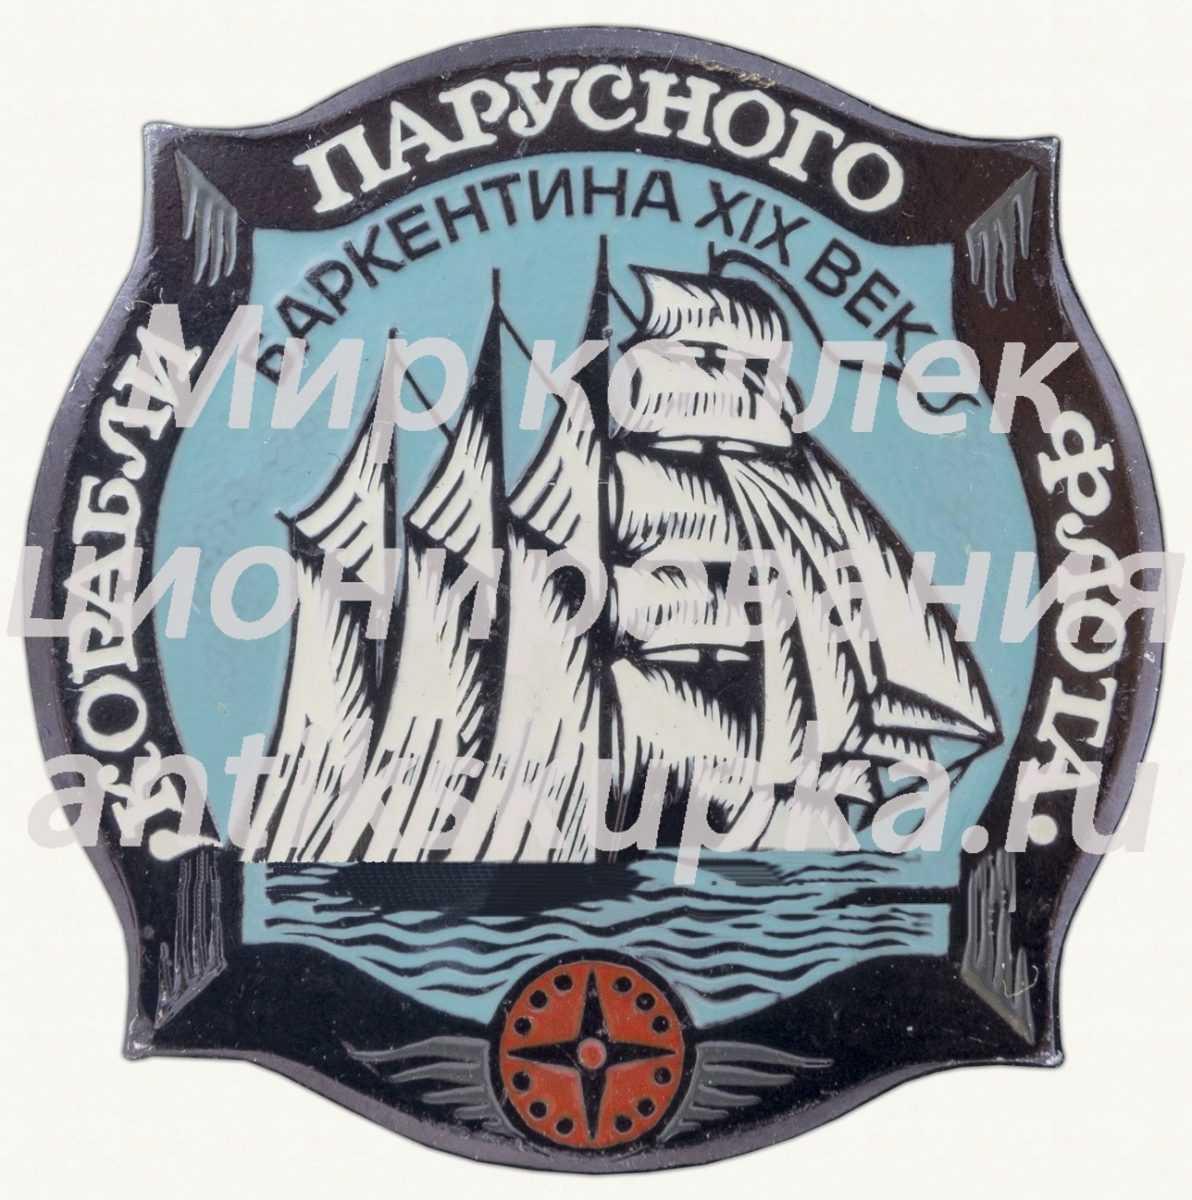 «Баркентина XIX век». Серия знаков «Корабли парусного флота»